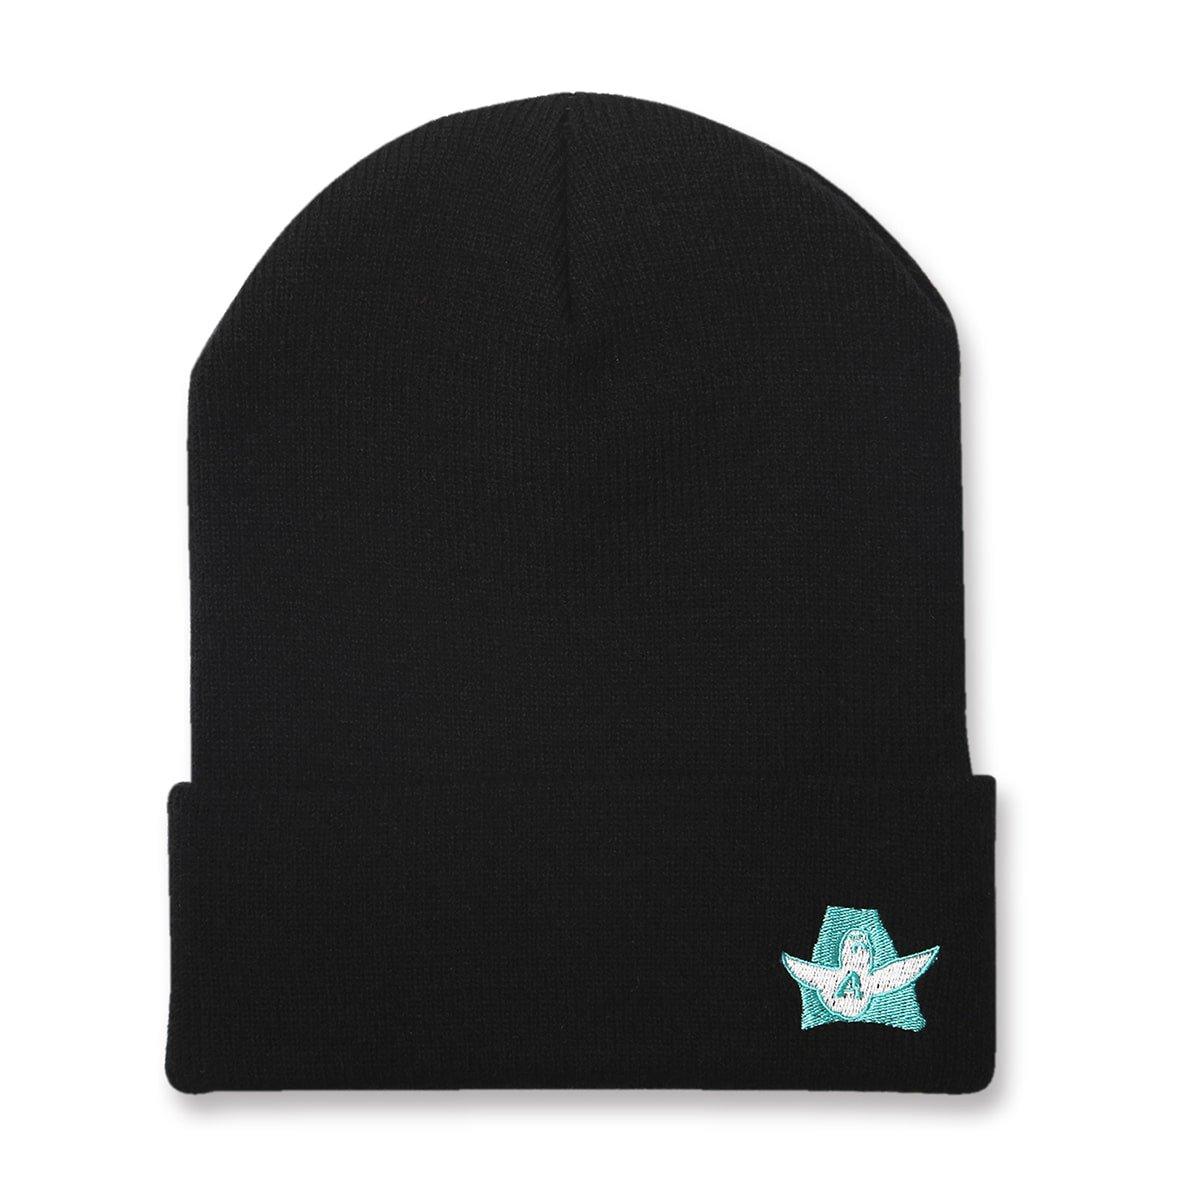 Mark Gonzales x Arch logo beanie【black】